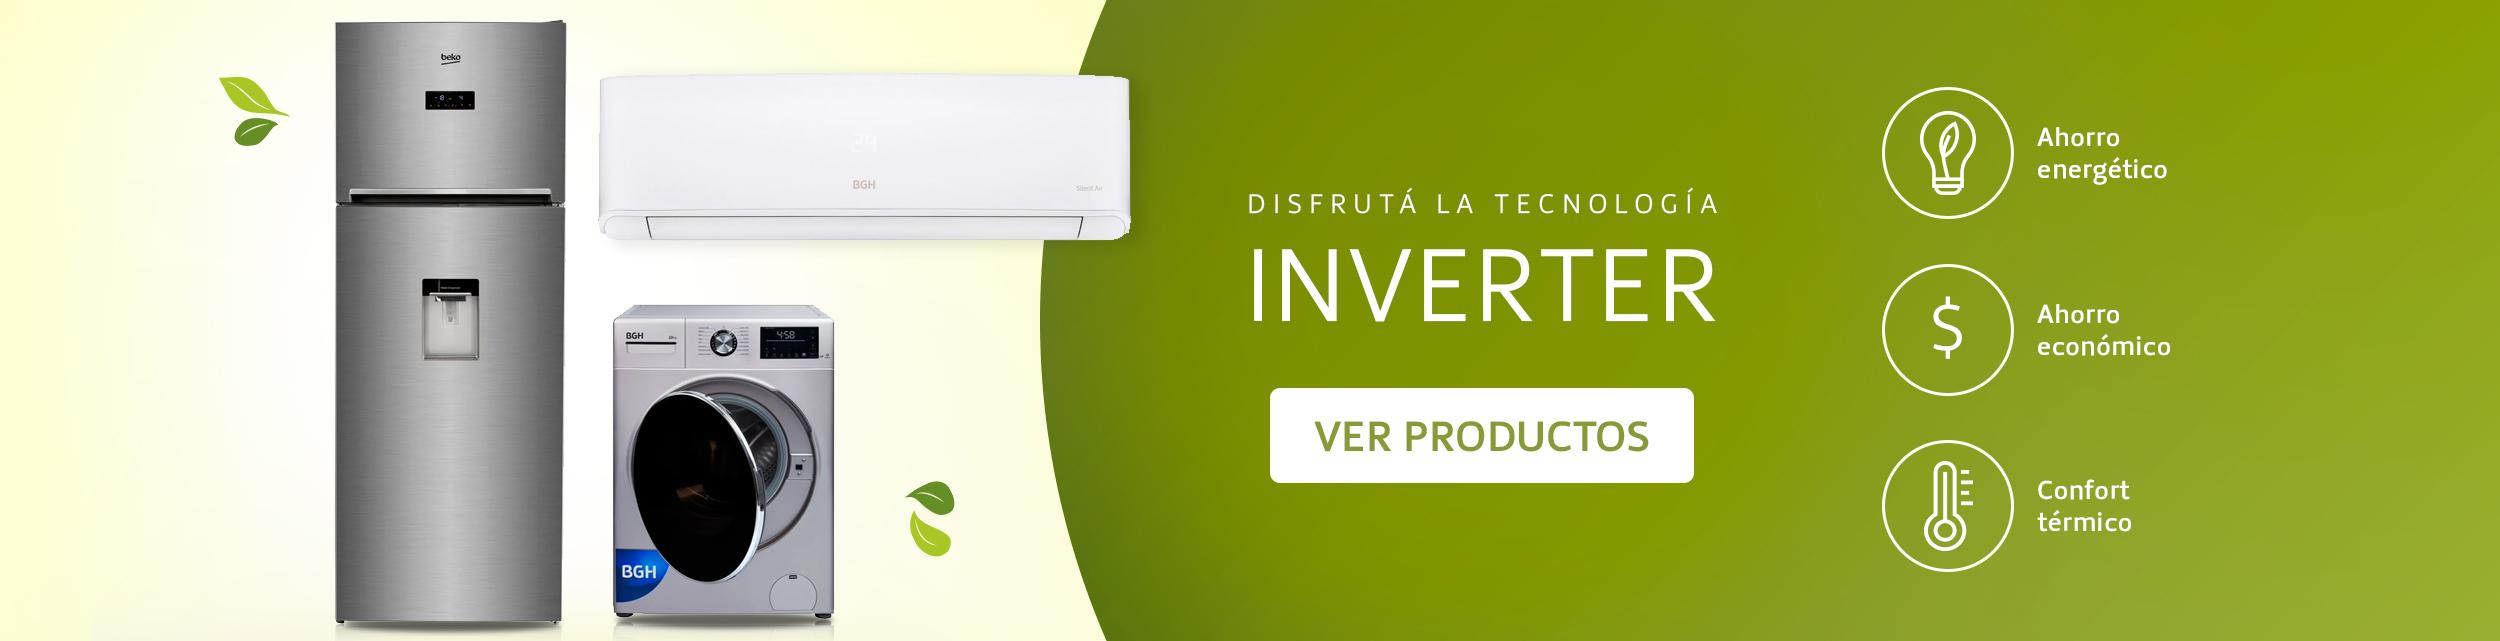 Ppal Inverter